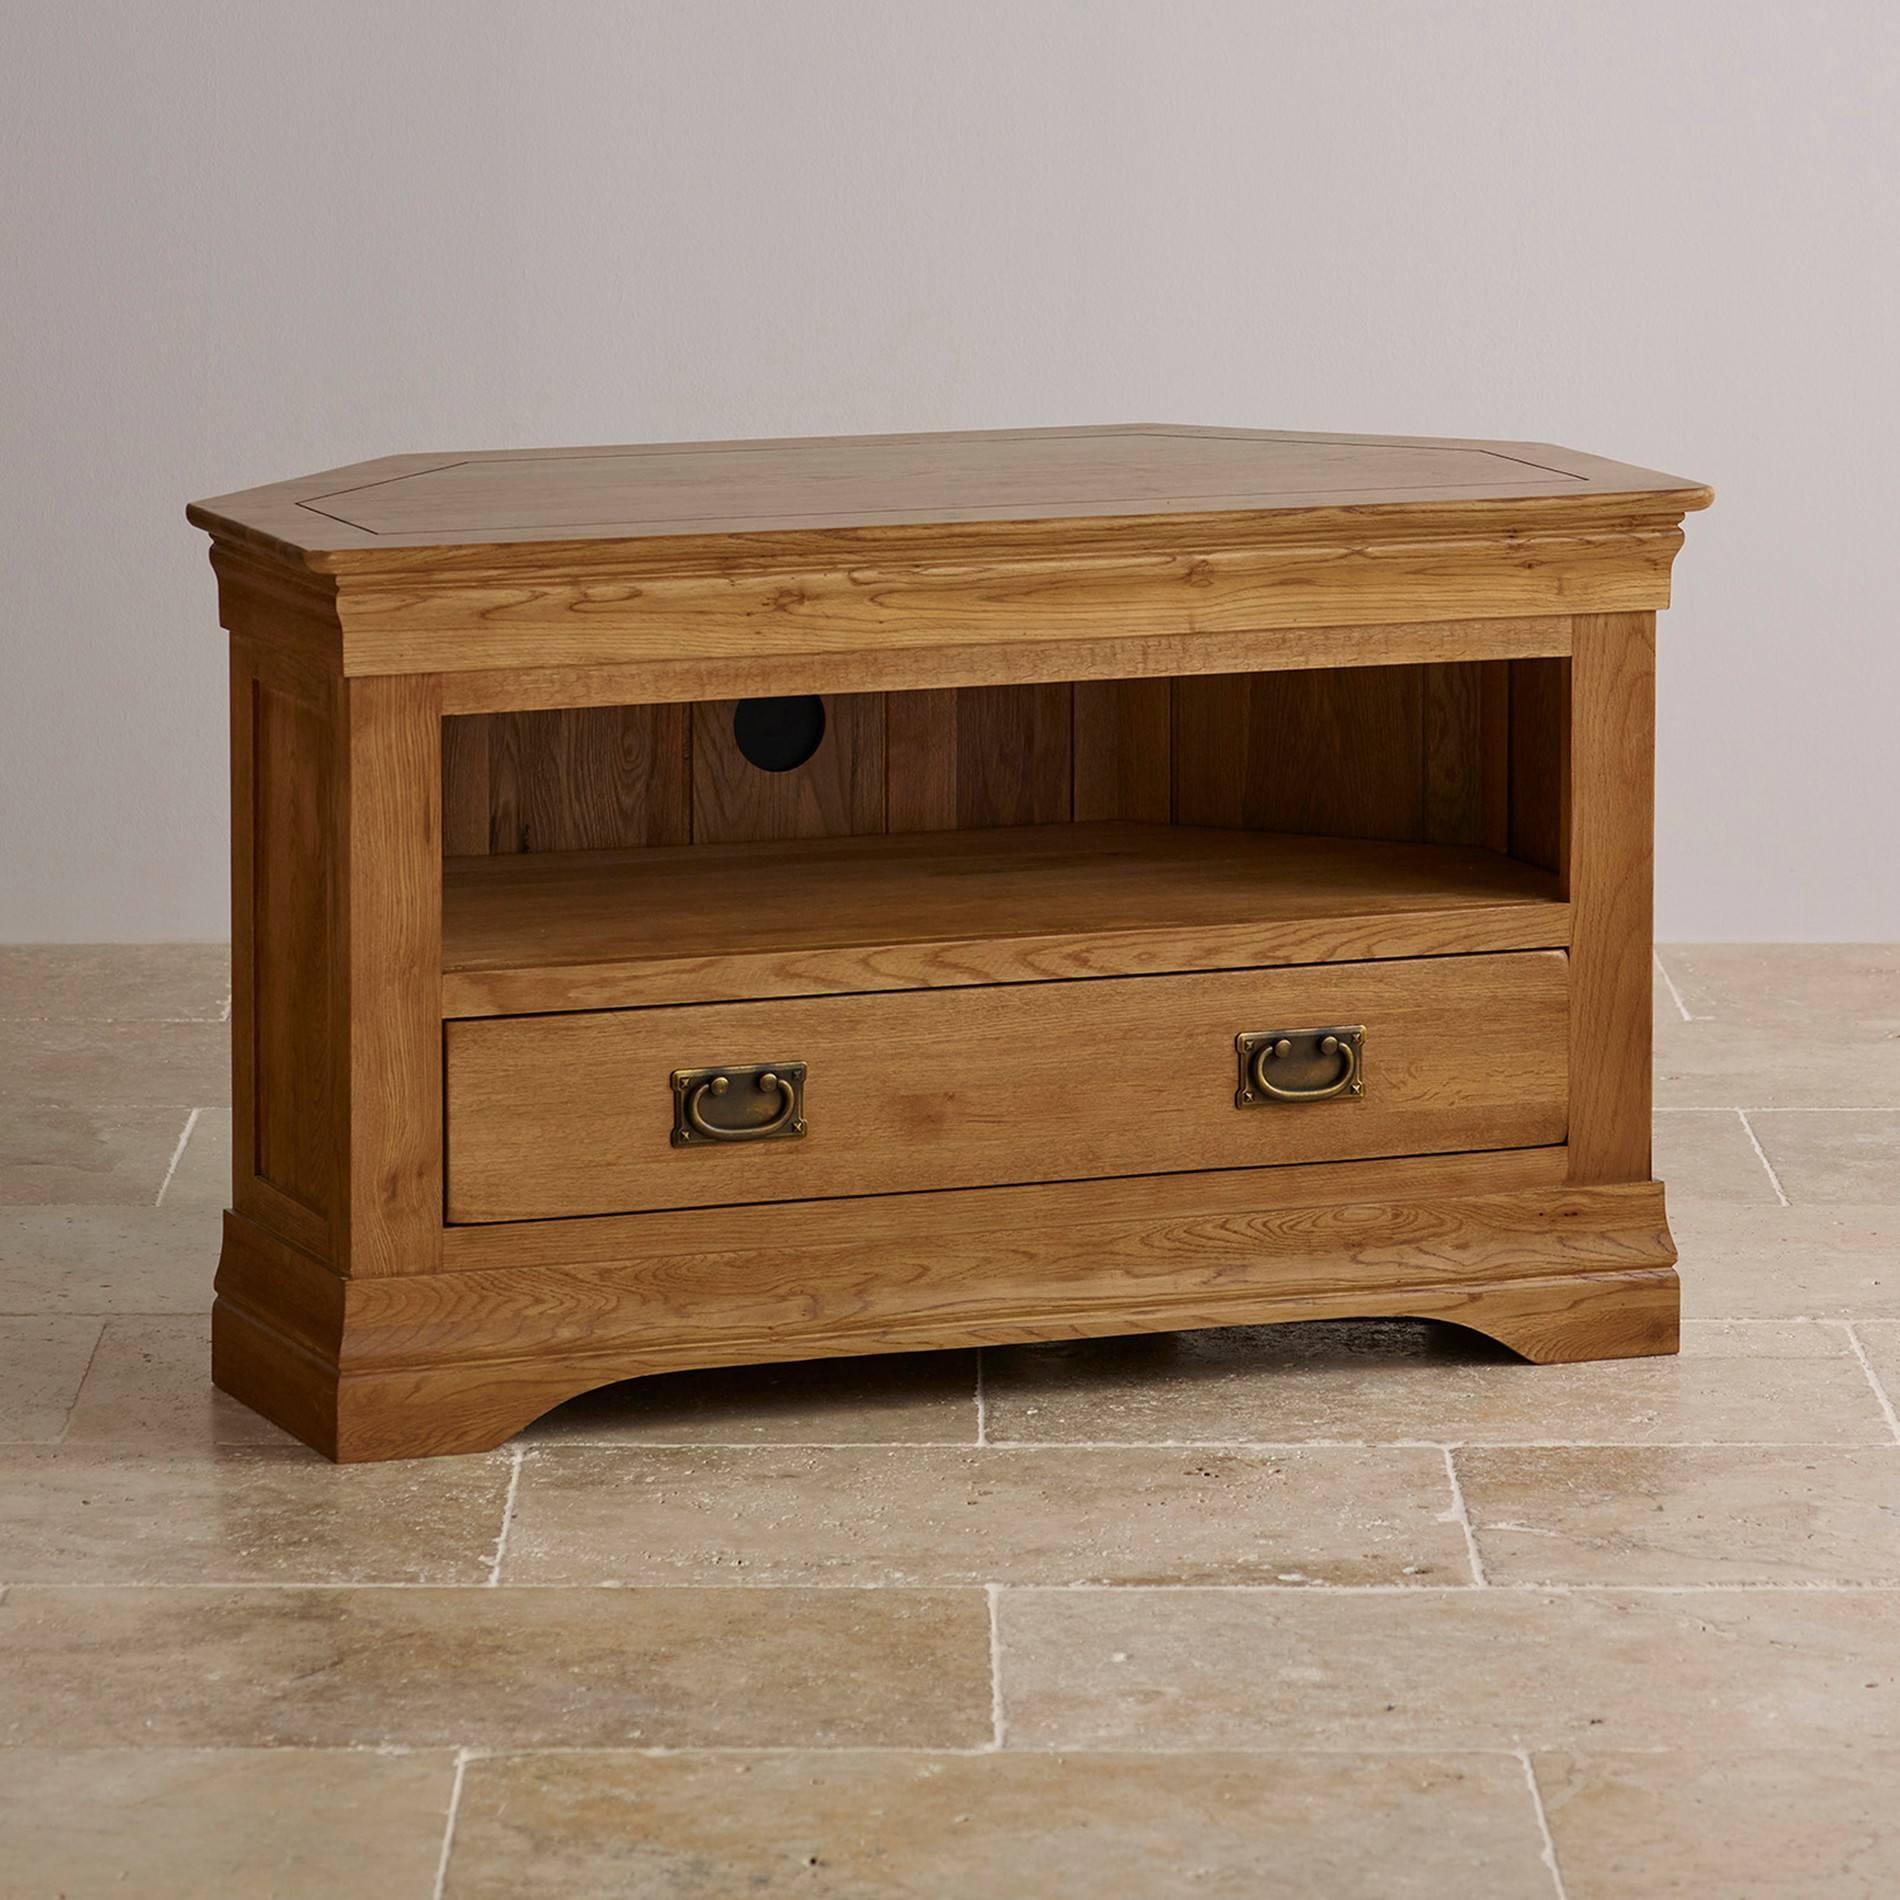 French Farmhouse Corner Tv Unit | Solid Oak | Oak Furniture Land in Wood Corner Tv Cabinets (Image 6 of 15)